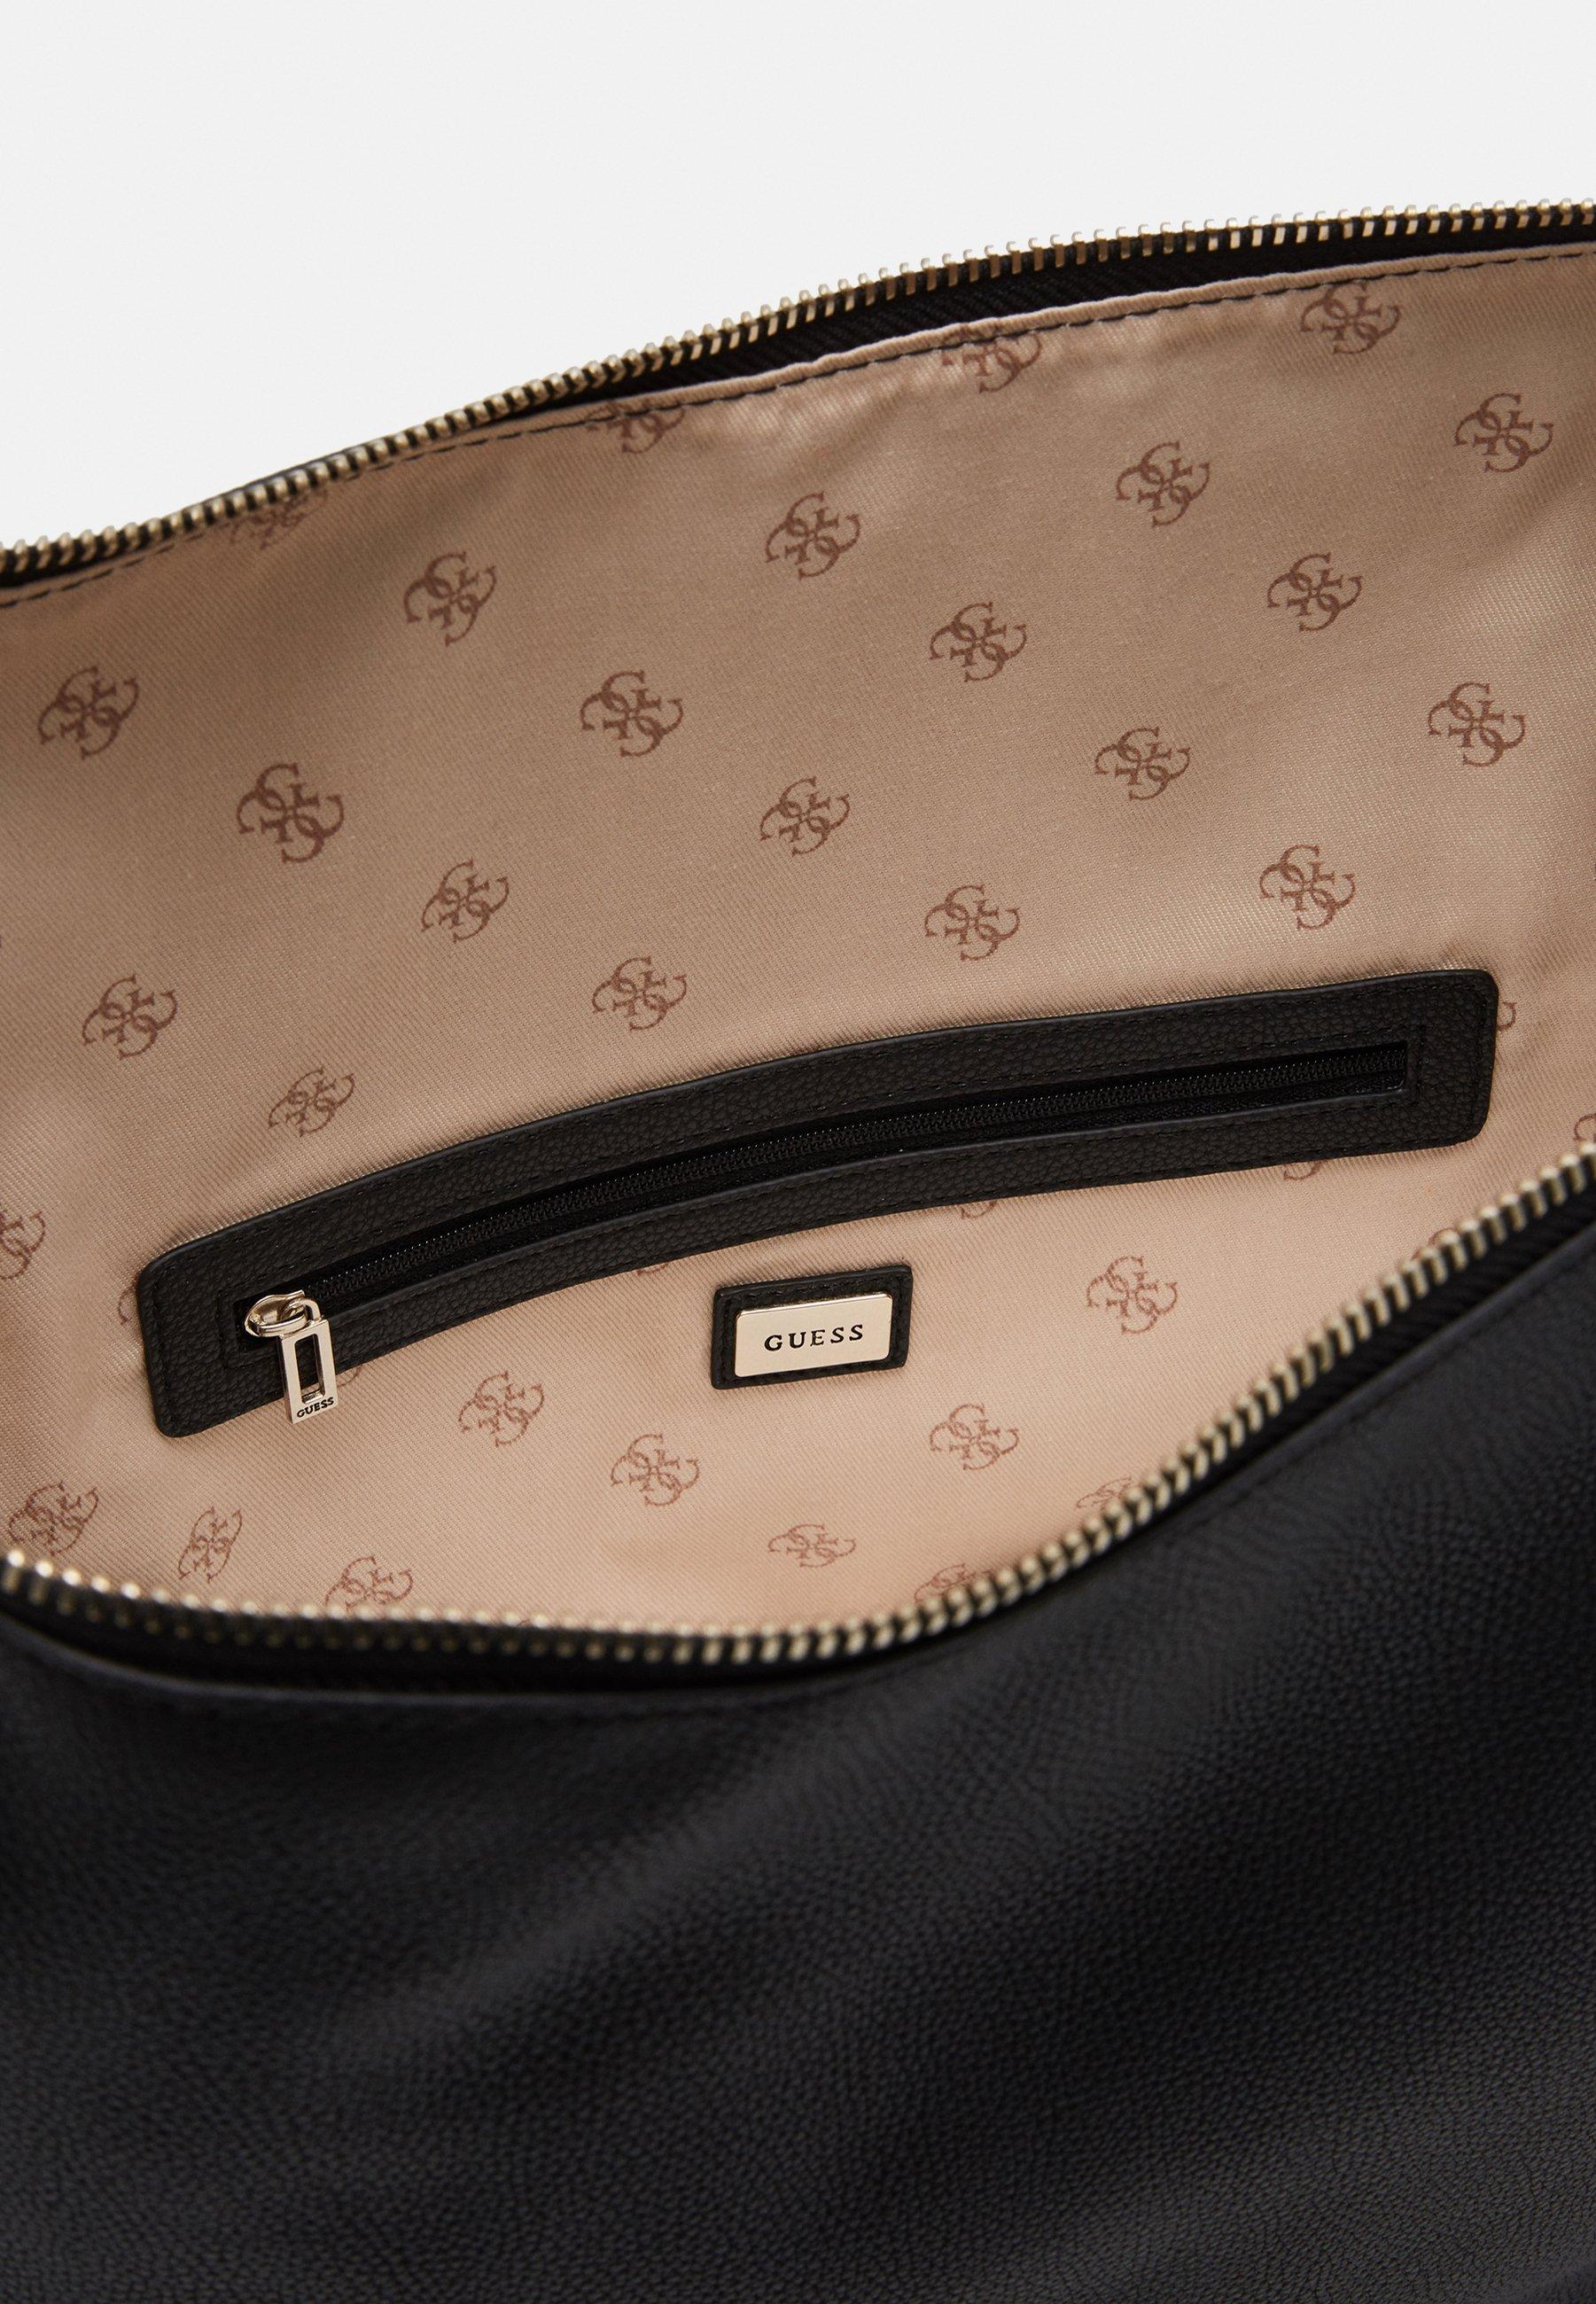 Guess Chain Large Hobo - Shopping Bag Black/schwarz